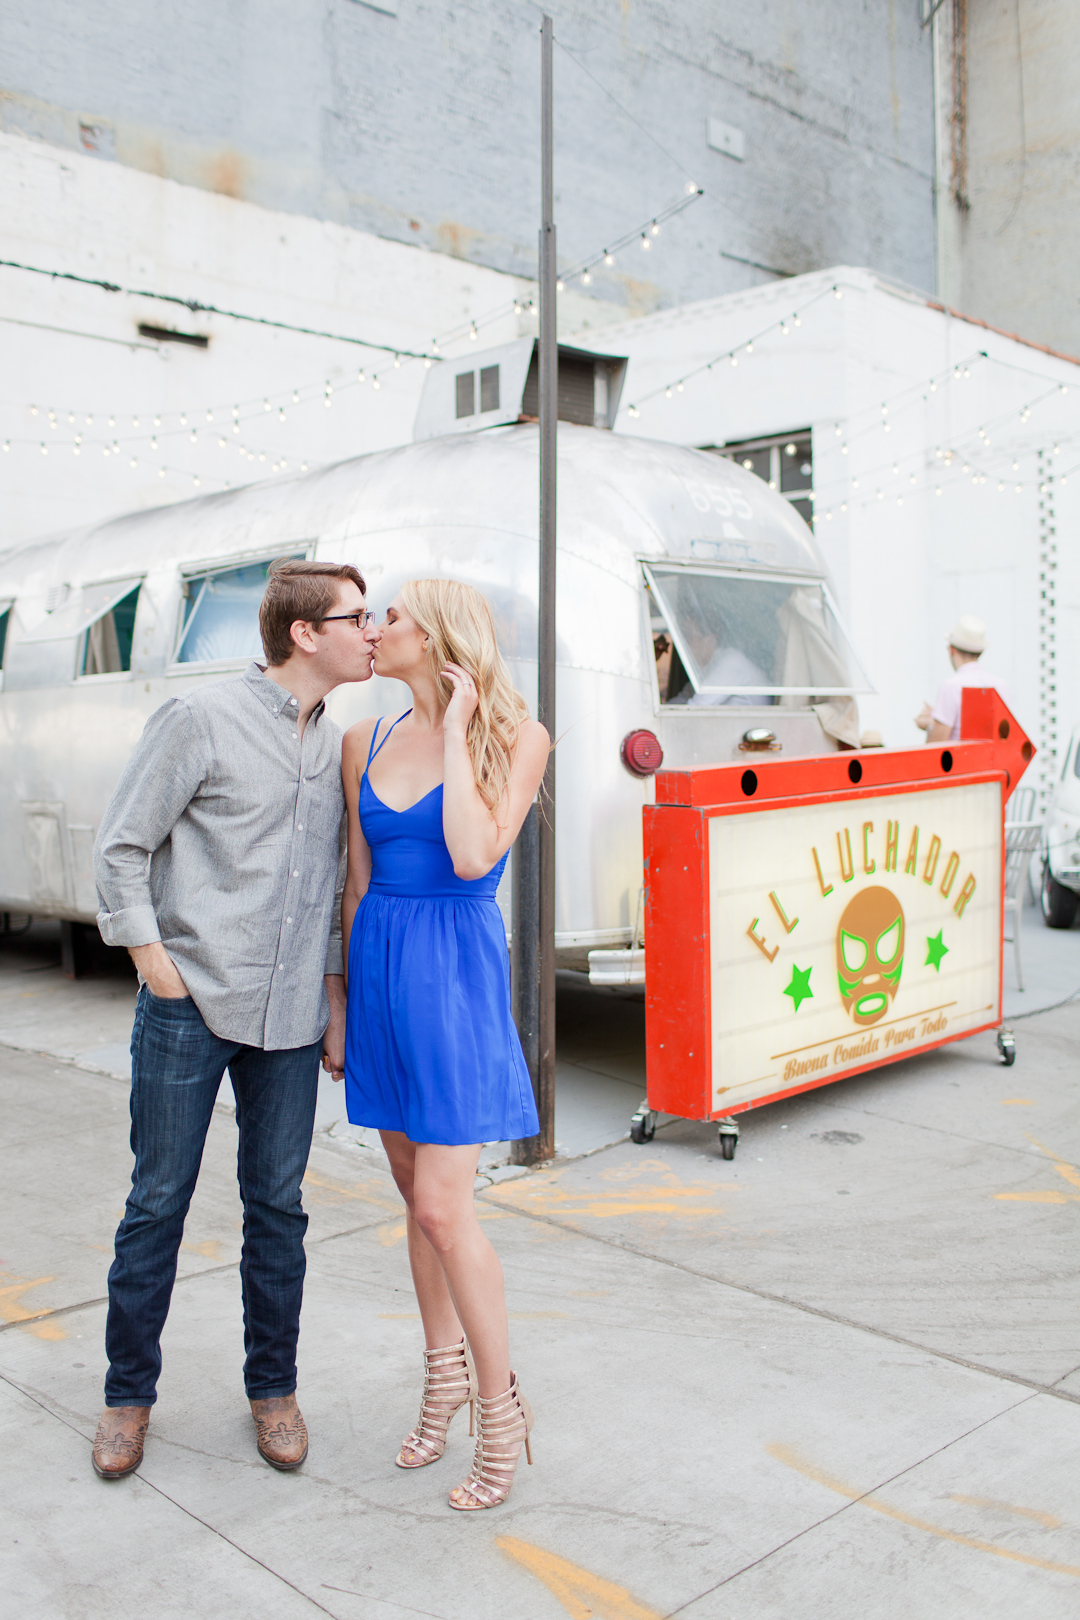 Melissa Kruse Photography - Kelley & Billy Engagement Photos-68.jpg